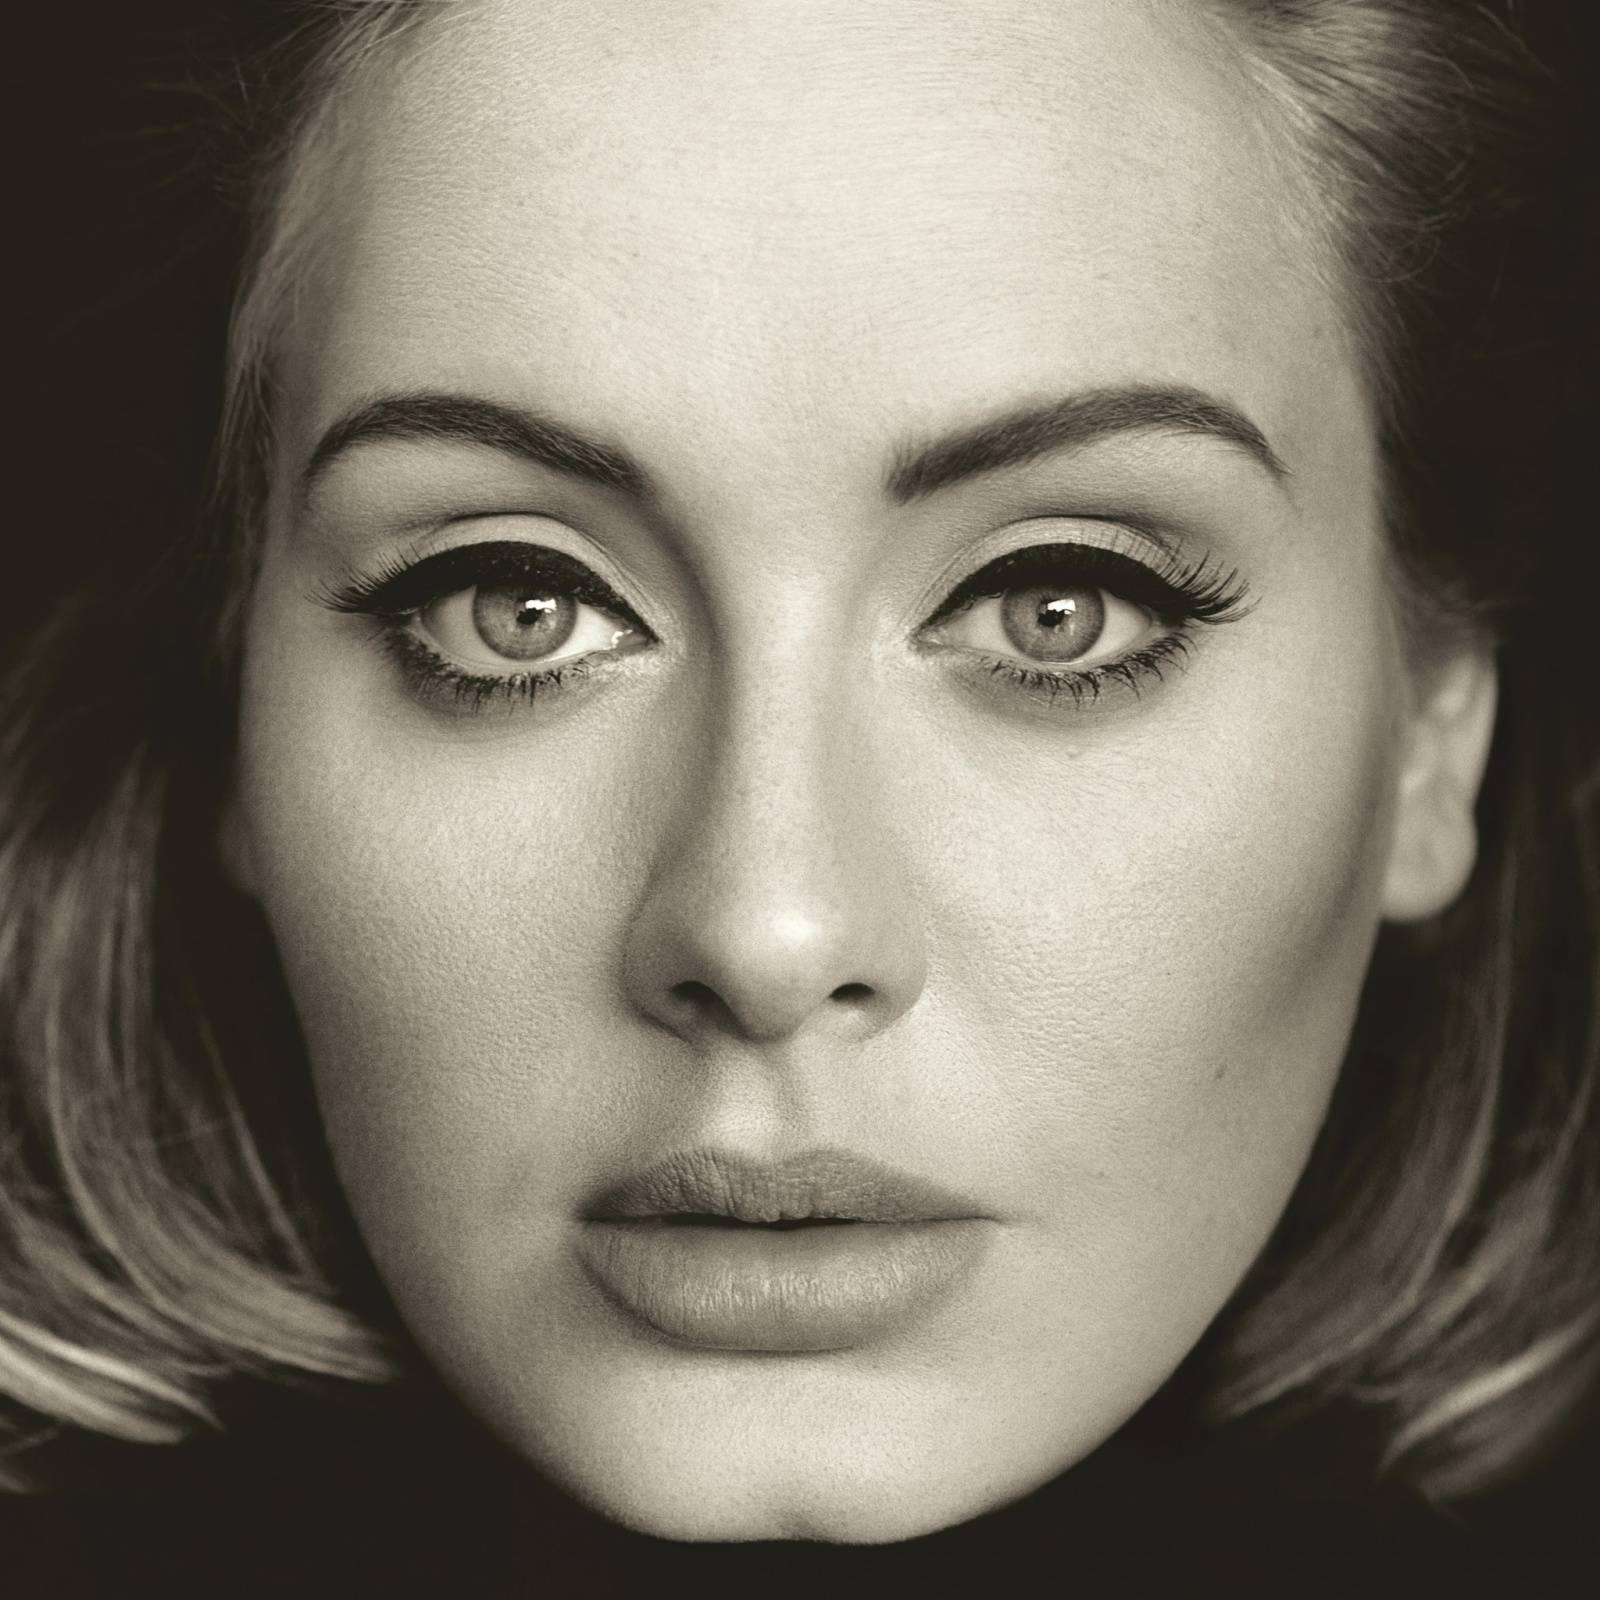 RECENZE 25: U hudby Adele nehraje faktor času žádnou roli